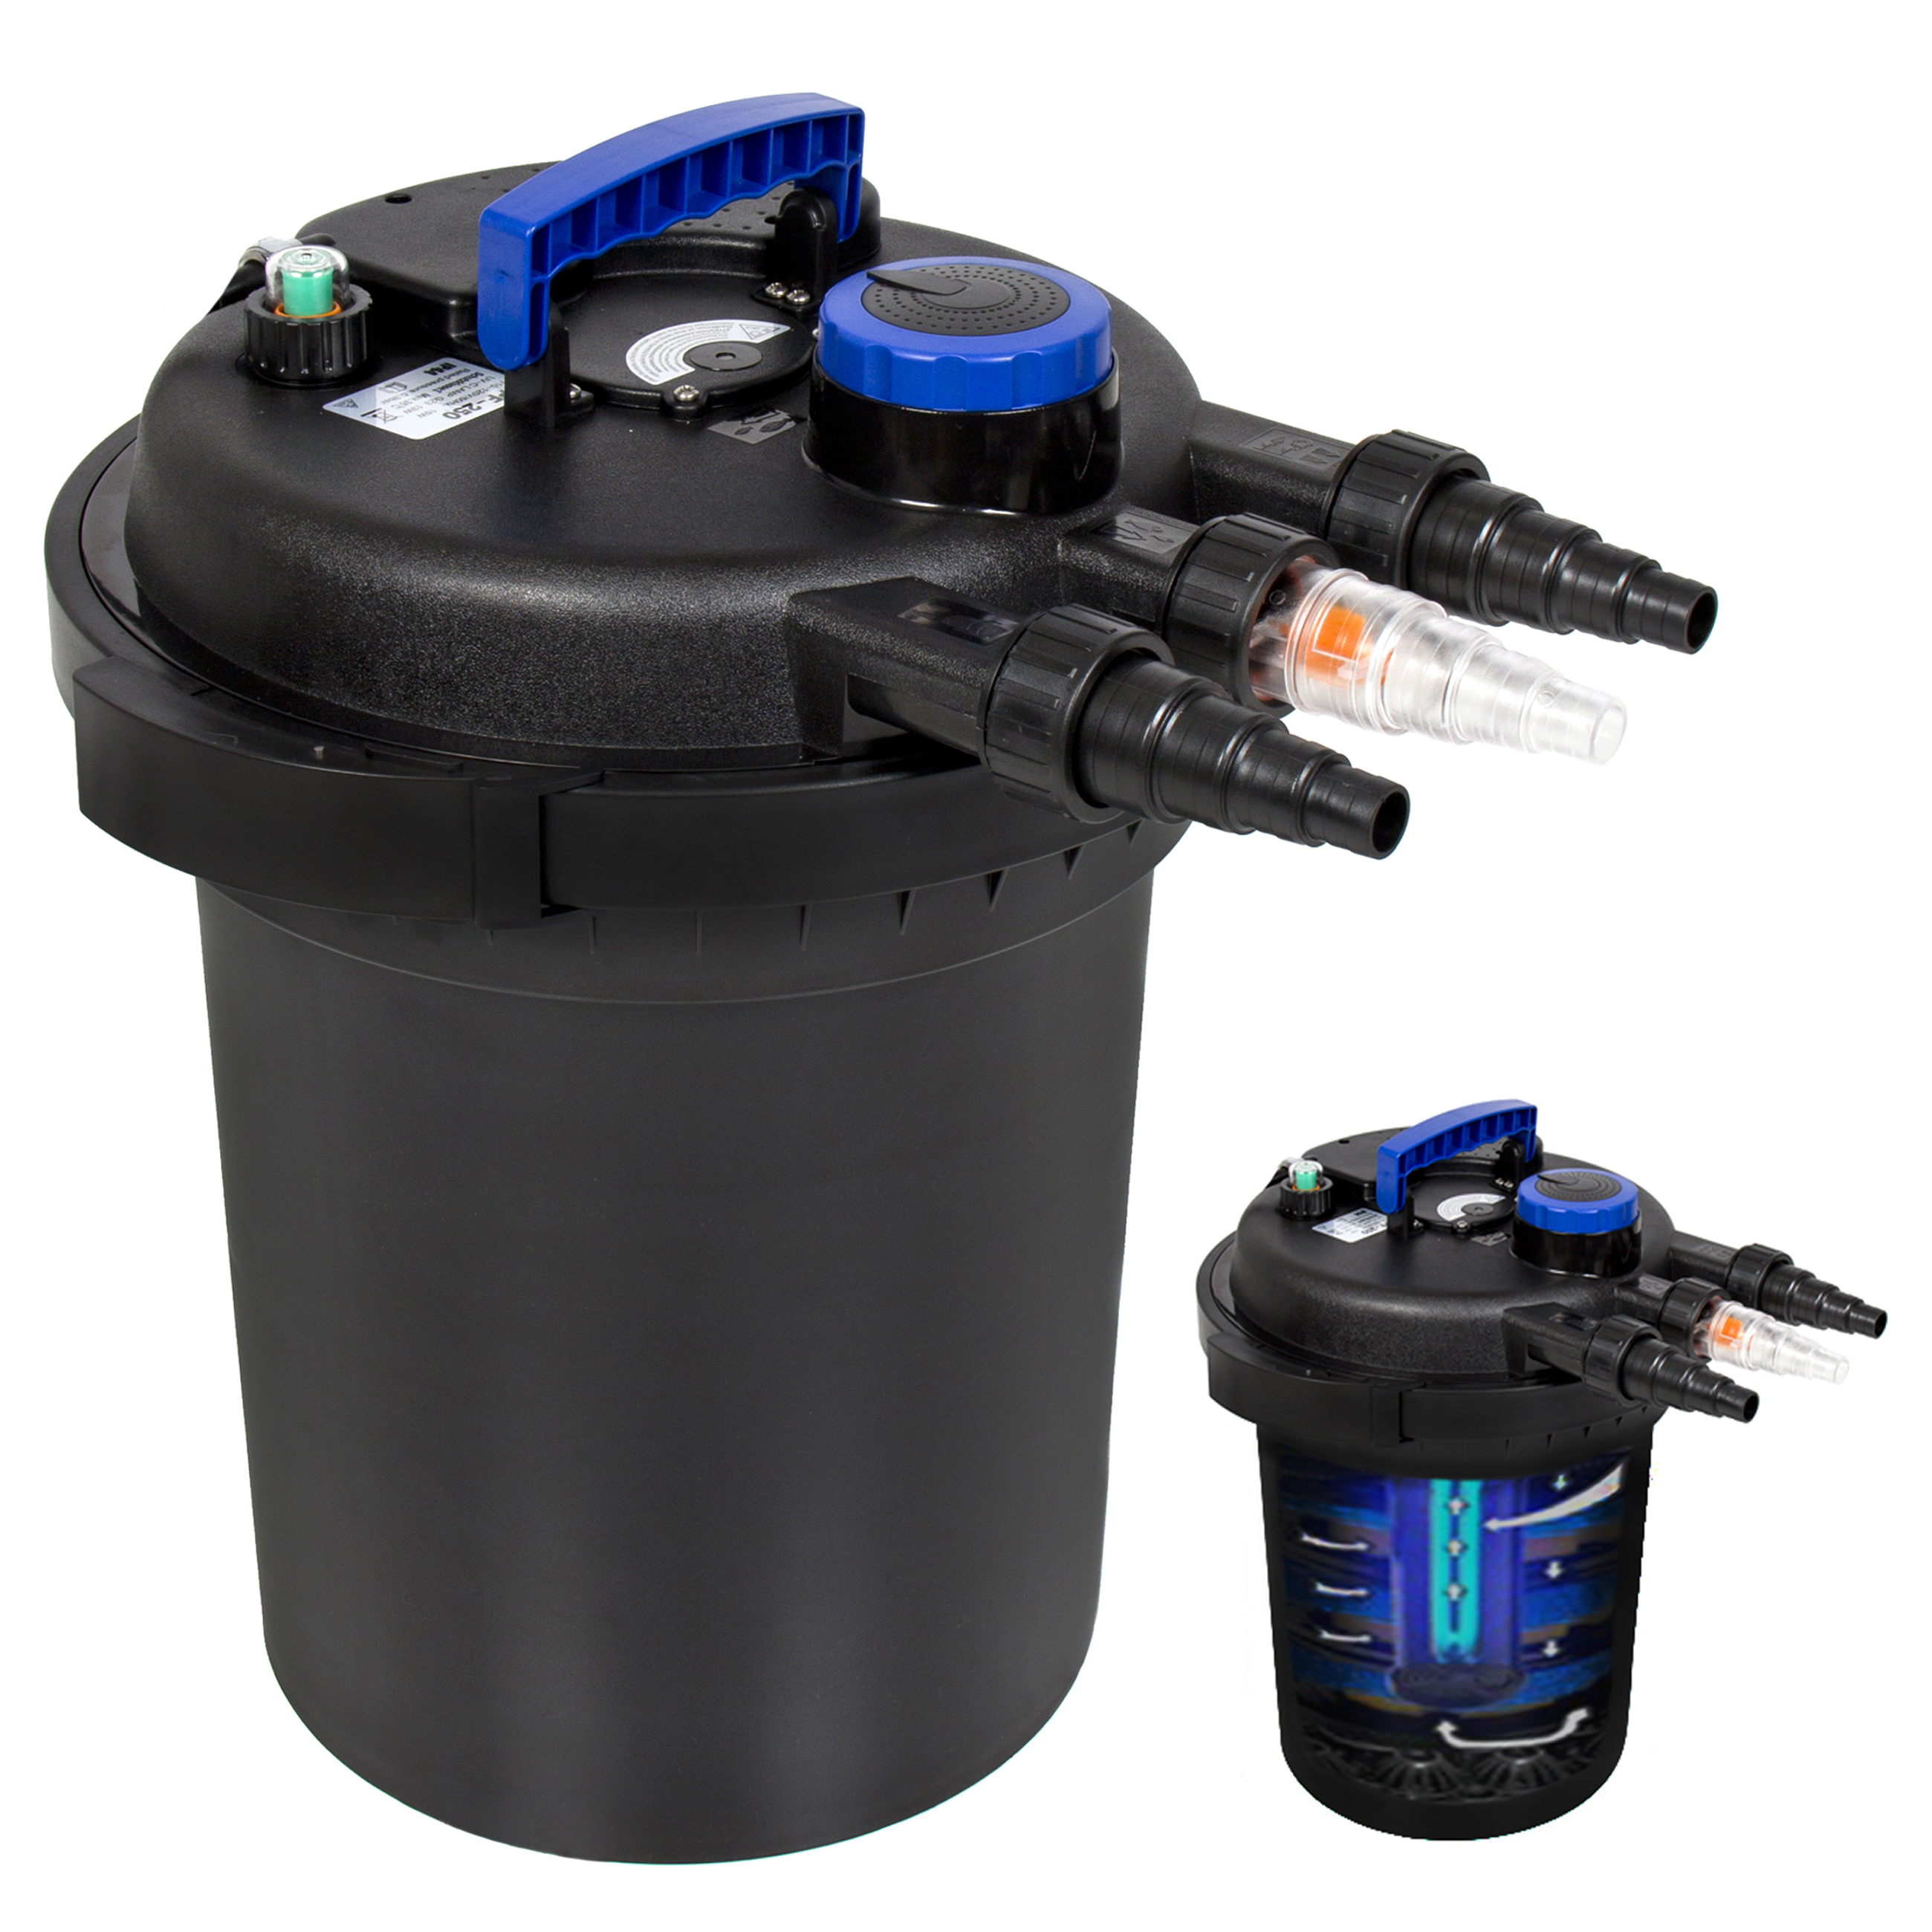 Boyu Garden Fish Pond Bio Filter and Pump with UV Steriliser and Hose Complete S